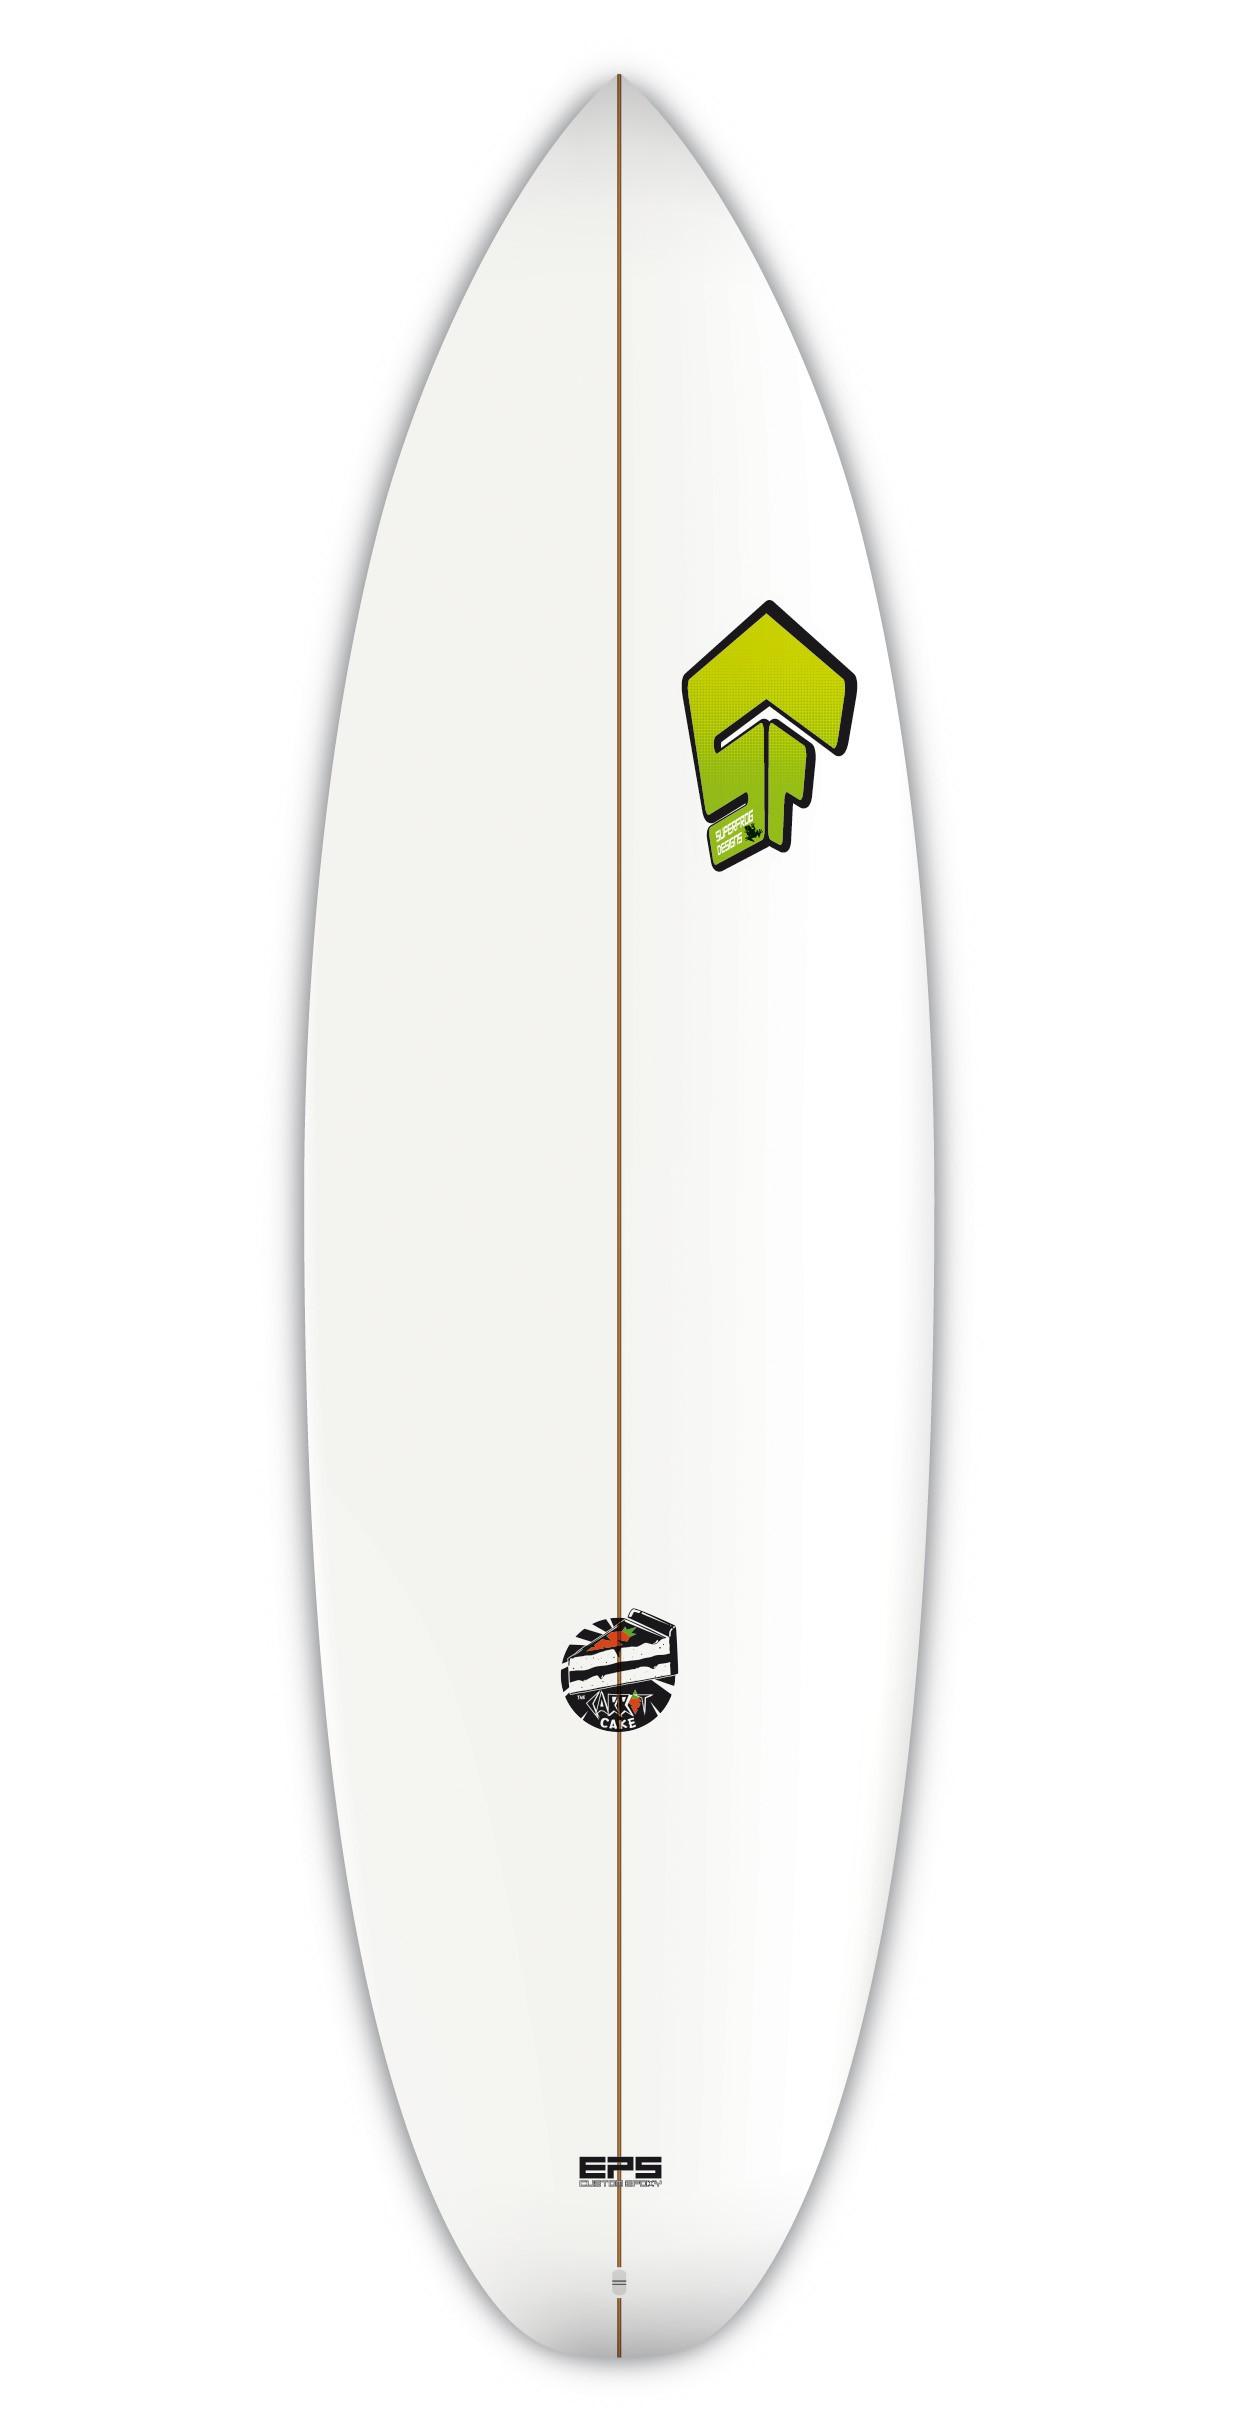 Planche de surf Superfrog Carrot Cake 6'4